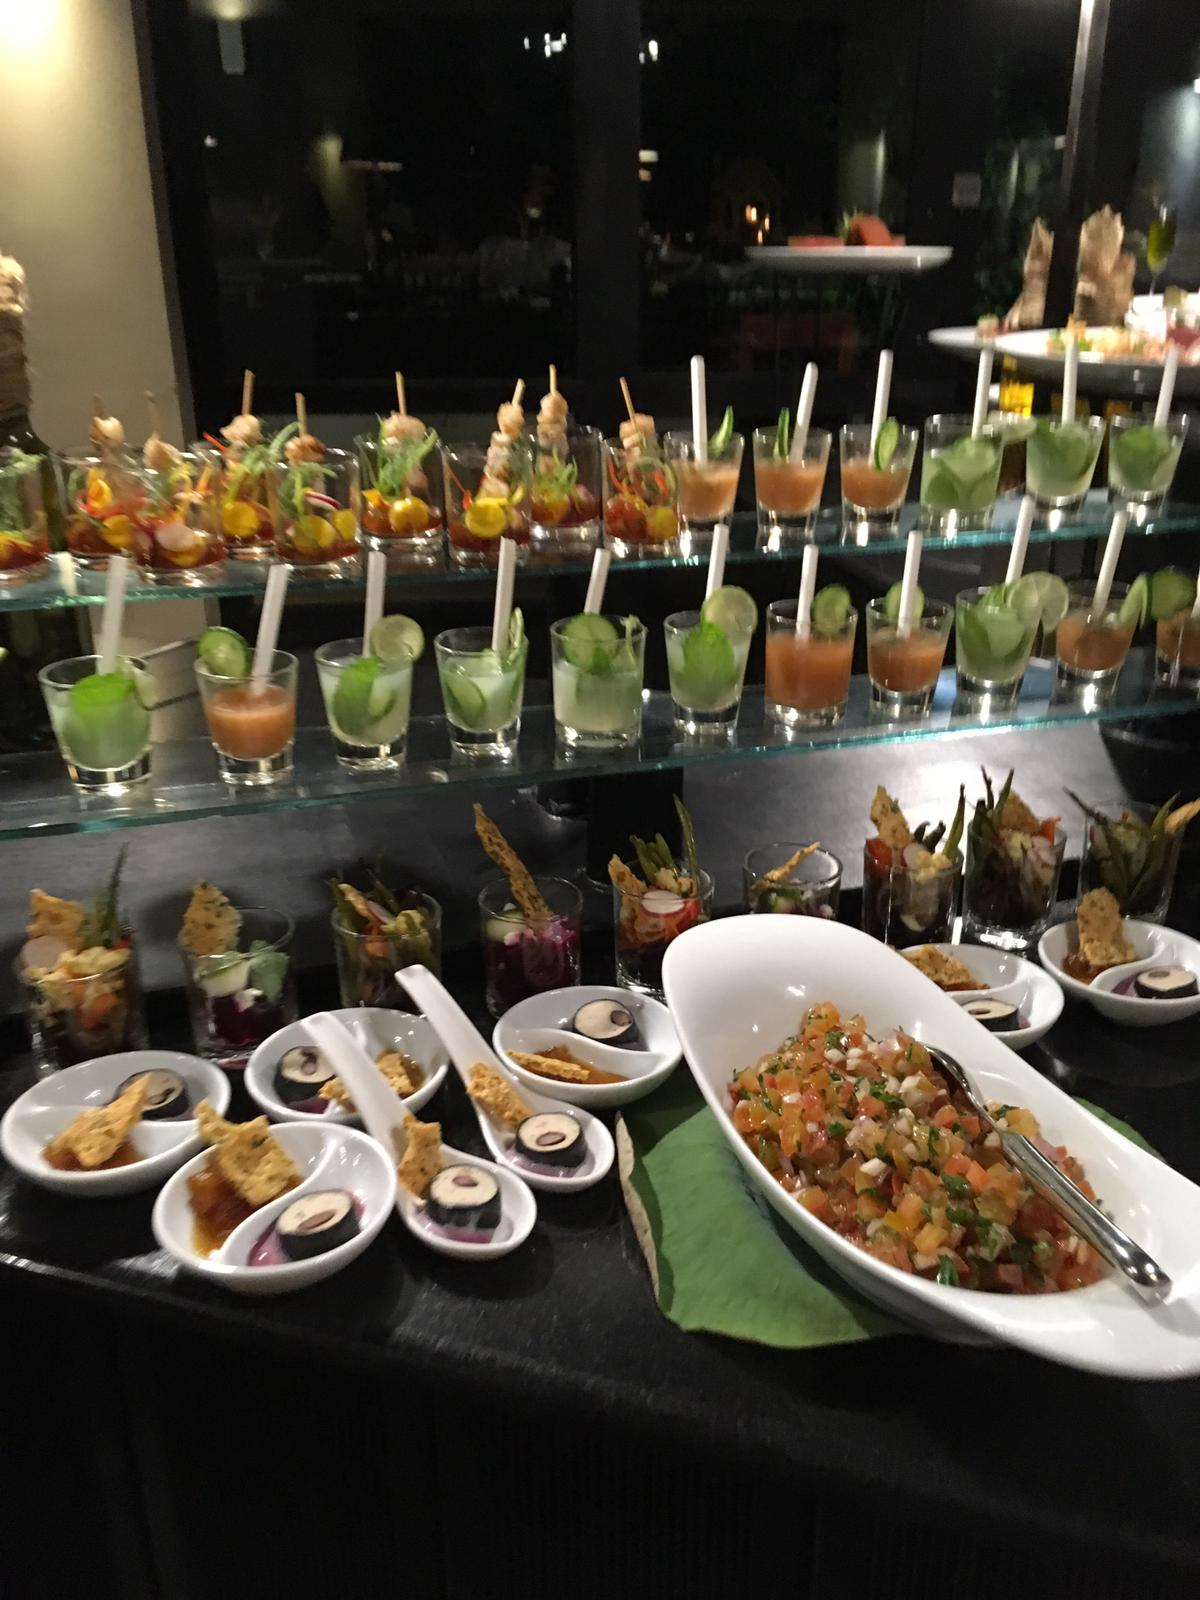 invite-to-paradise-sri-lanka-family-holiday-specialists-customer-feedback-pickering-jetwing-yala--food-buffet.jpg